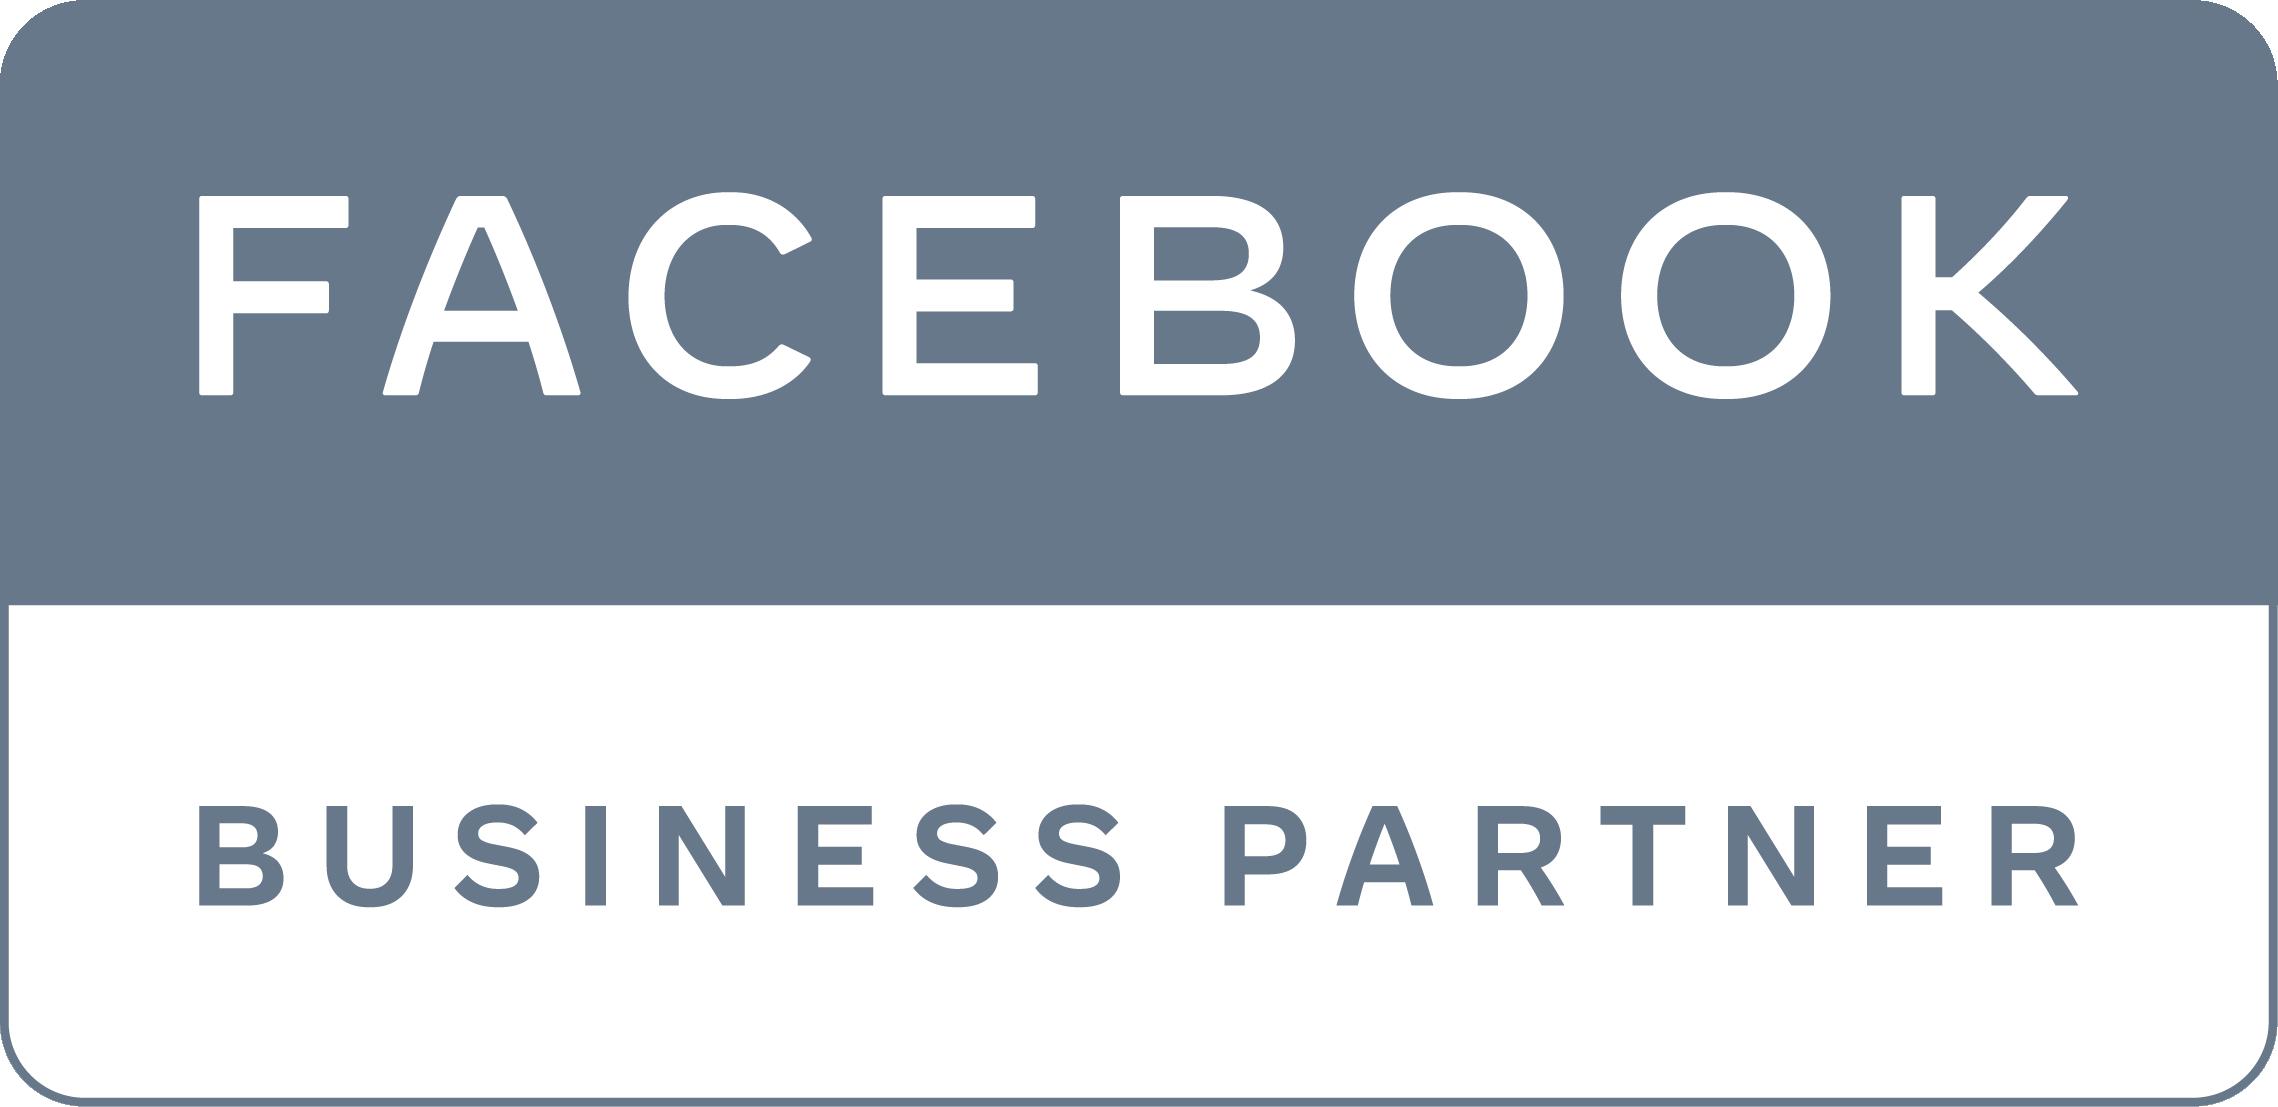 https://mixdigital.com.ua/wp-content/uploads/2021/08/fbp-badges-partner-with-container_rgb.png